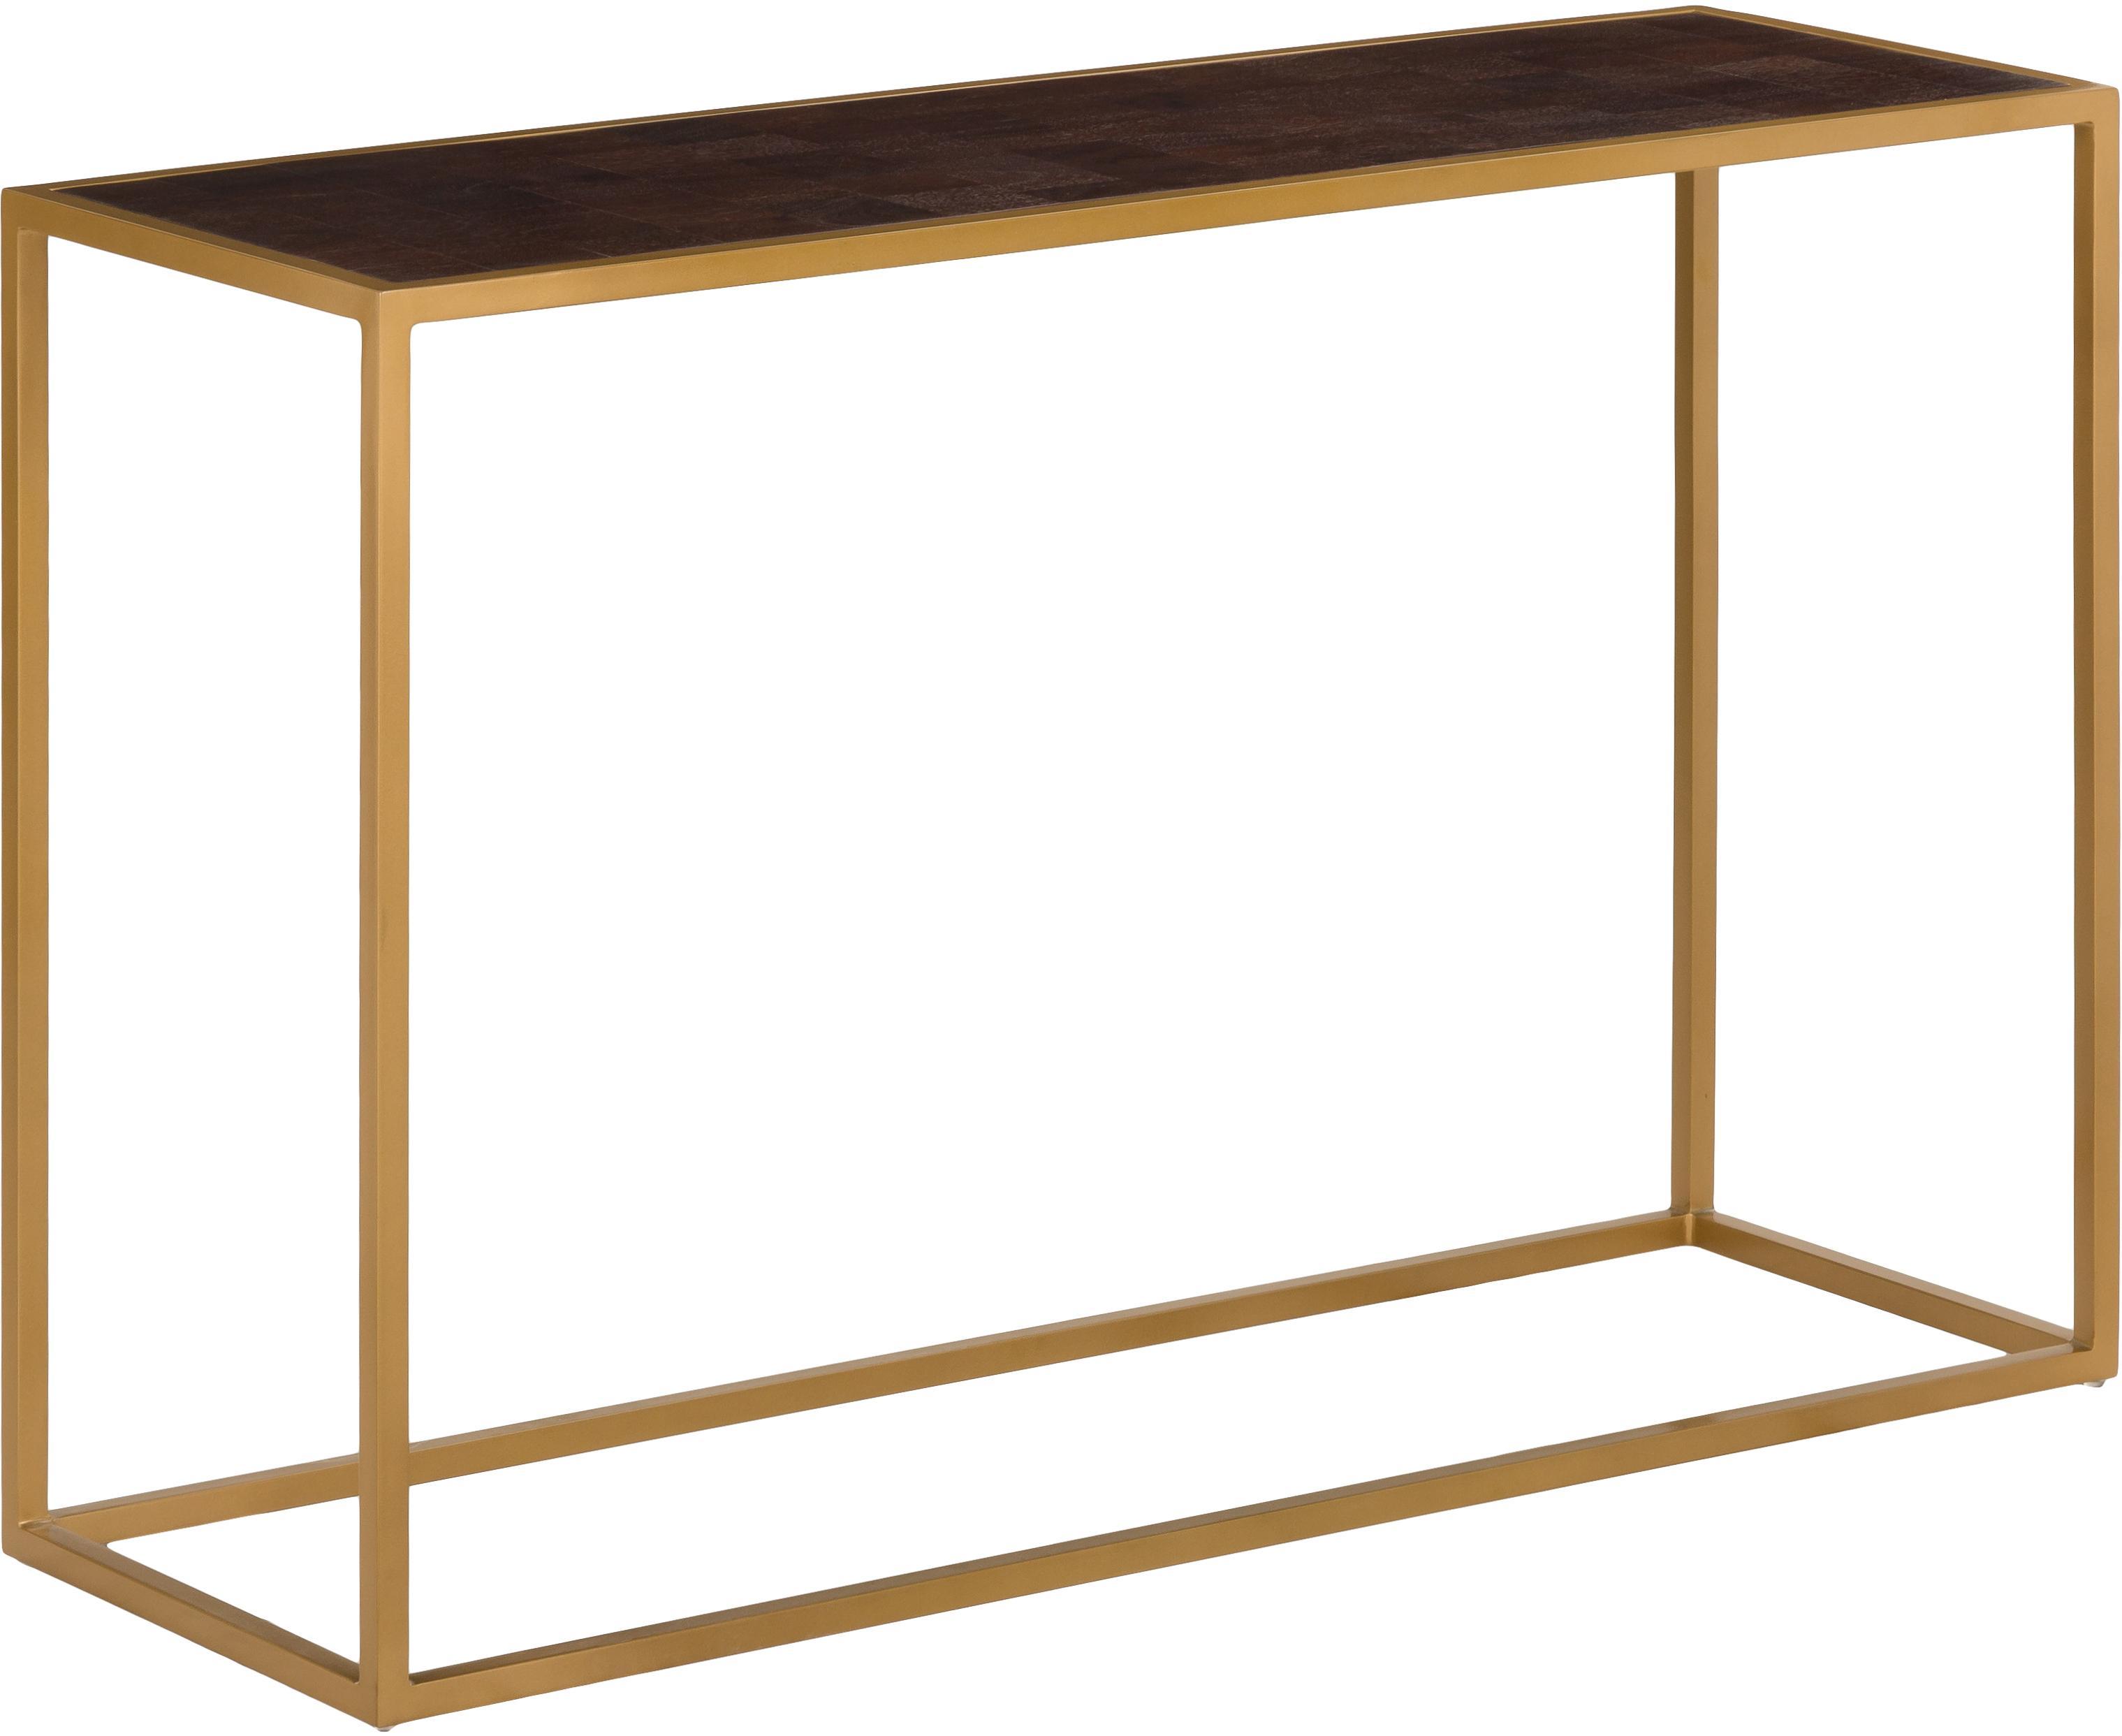 Sidetable James met goudkleurige frame, Tafelblad: gelakt massief mangohout, Frame: gepoedercoat metaal, Tafelblad: donker gelakt mangohout. Frame: mat goudkleurig, B 120 x D 40 cm